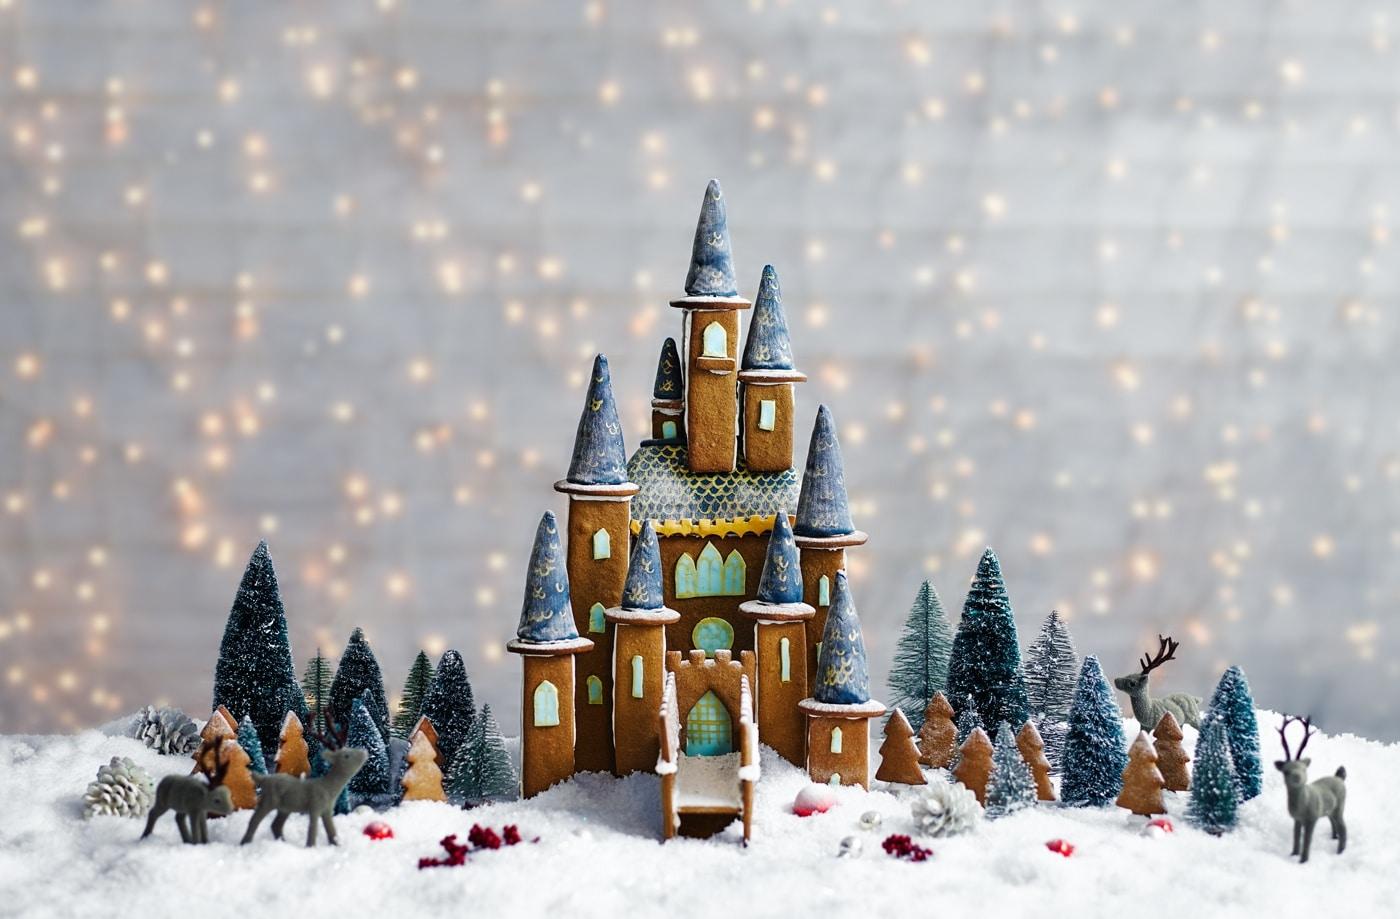 Gingerbread House Castle!